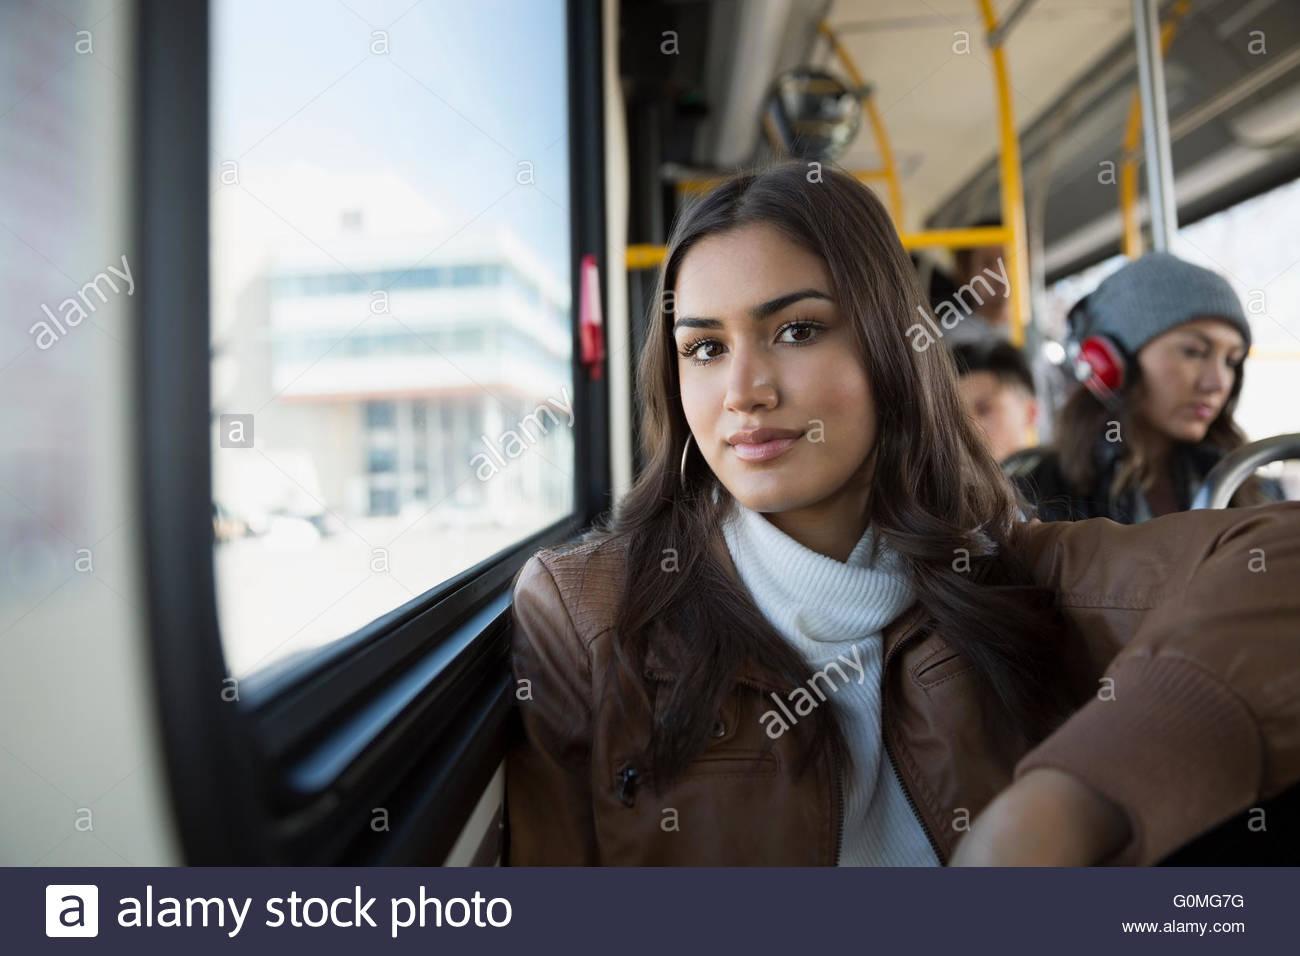 Portrait serious teenage girl riding bus - Stock Image